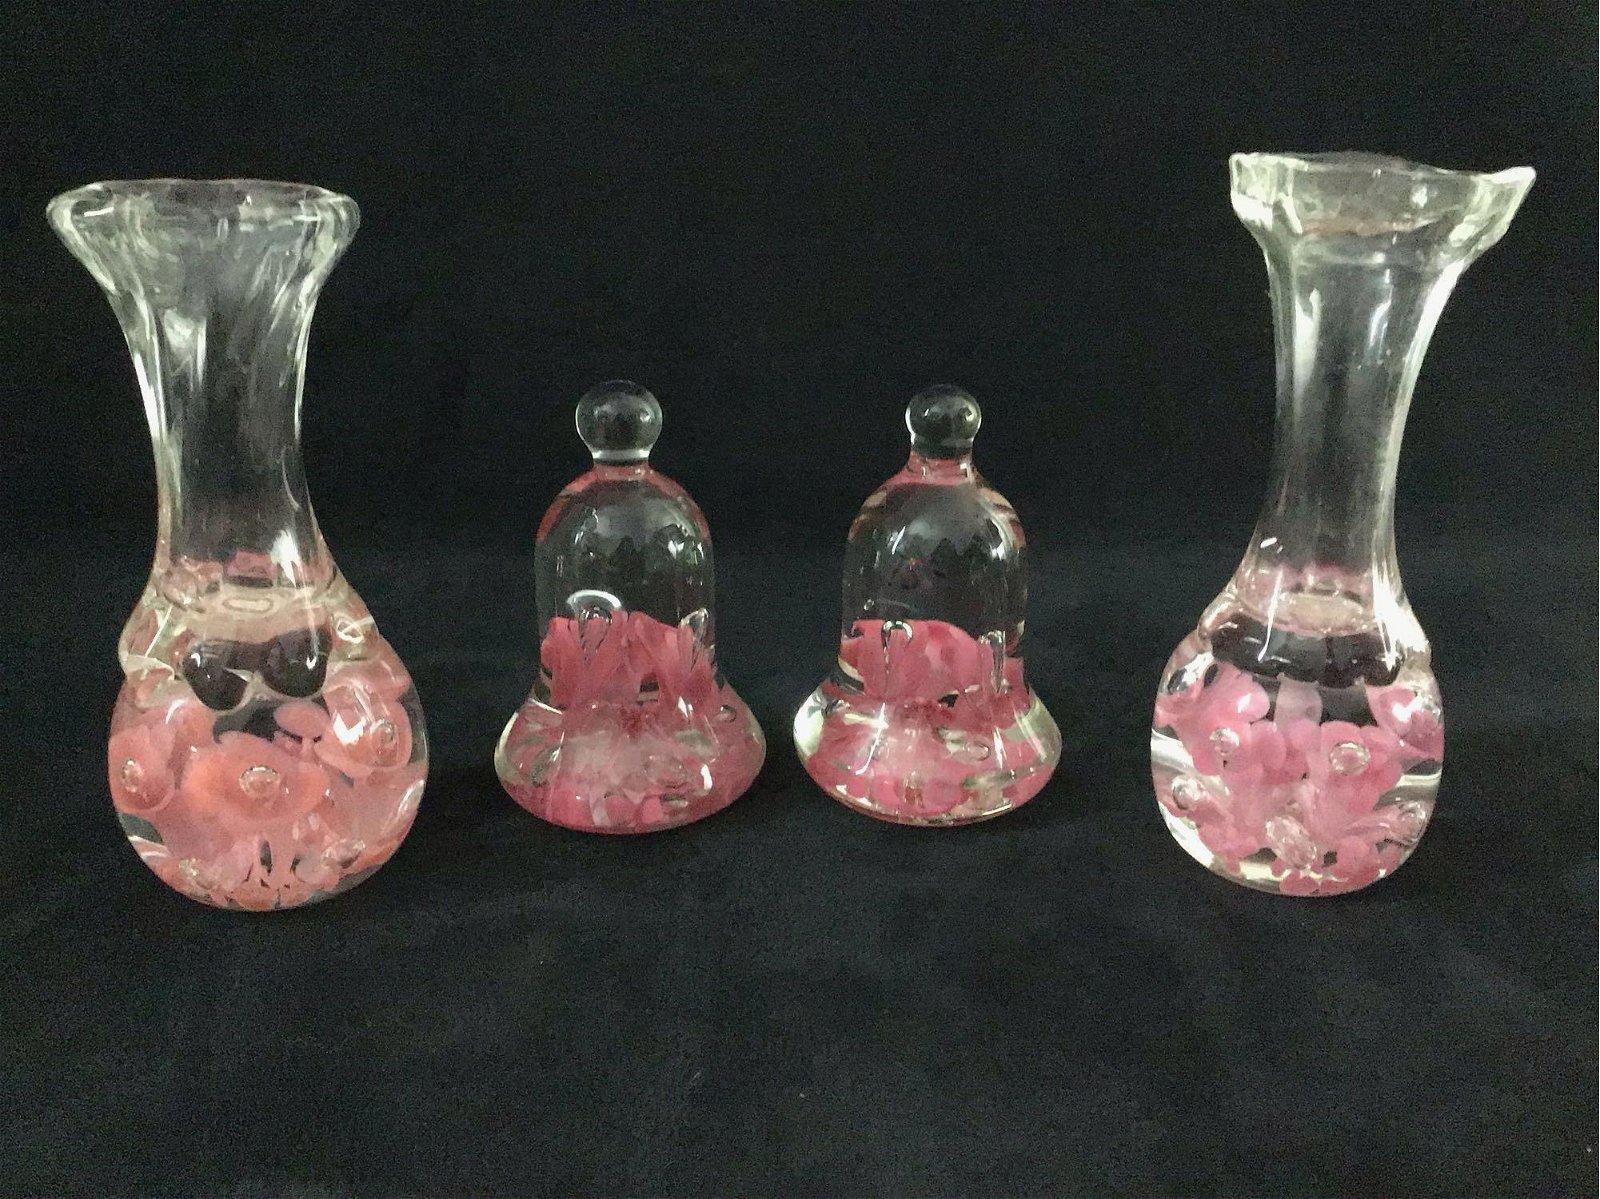 Vintage Glass Art Designer Joe Rice Candlestick Lot